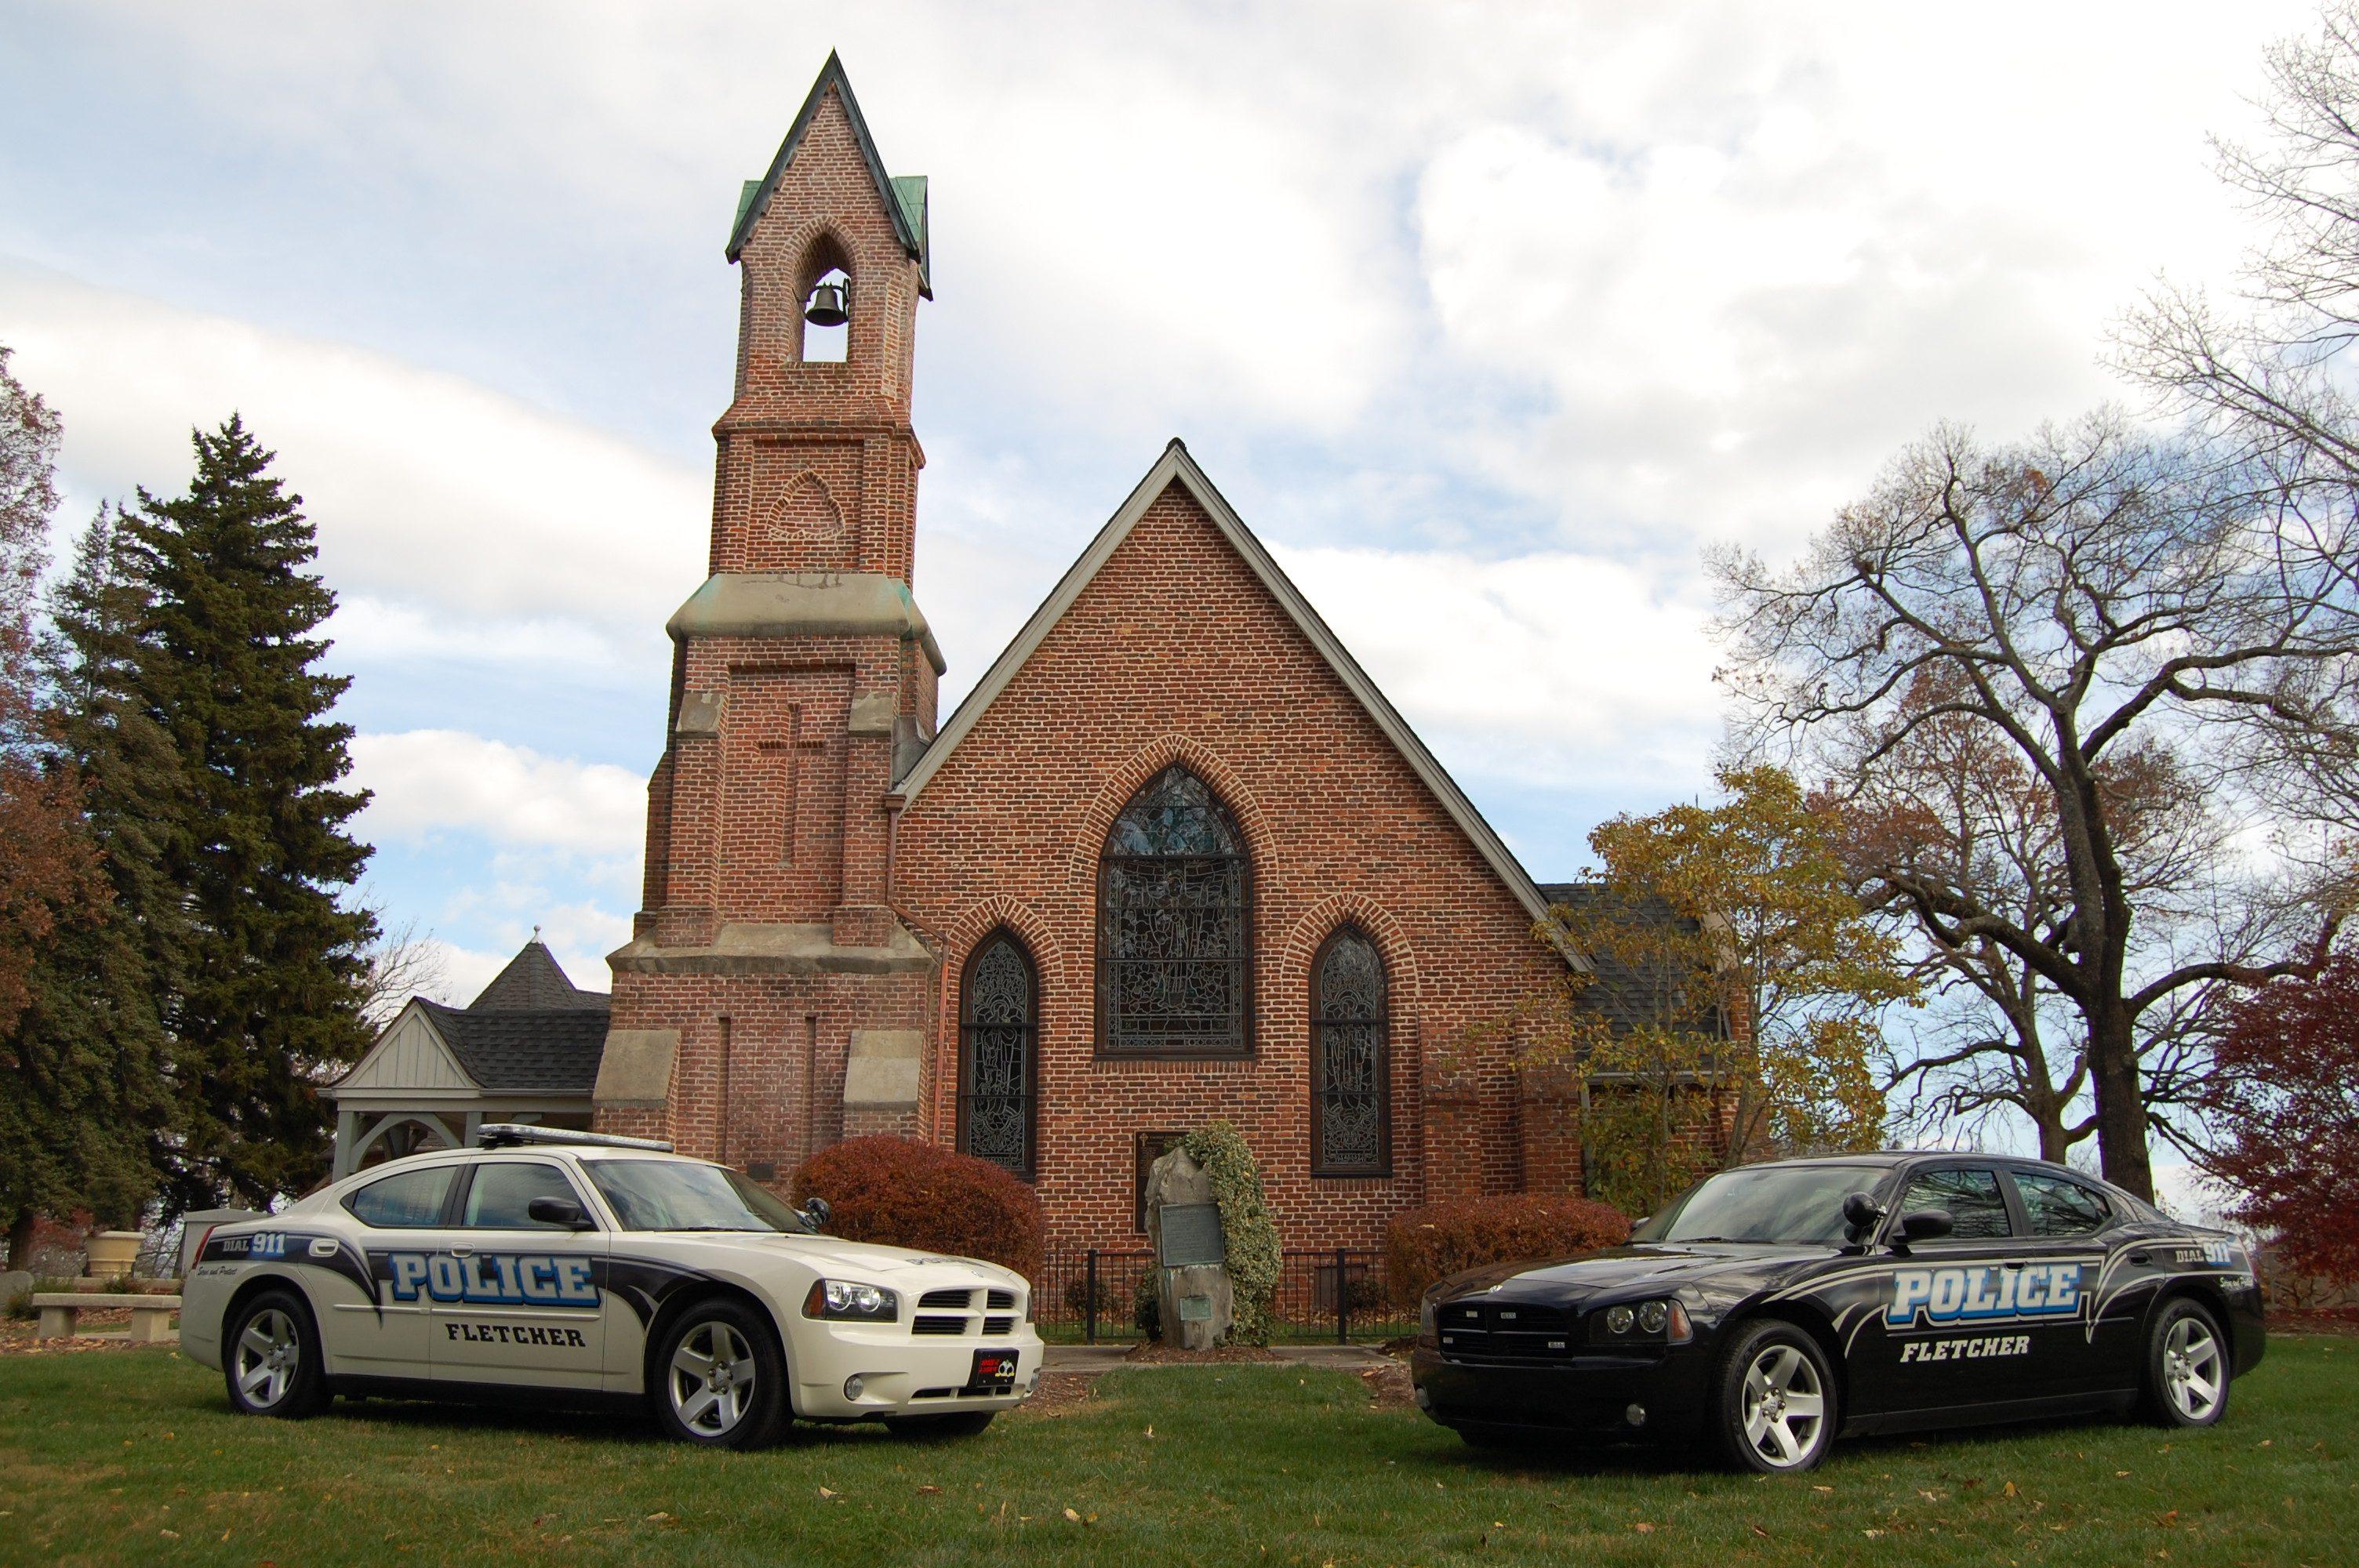 Fletcher Patrol Cars 2010